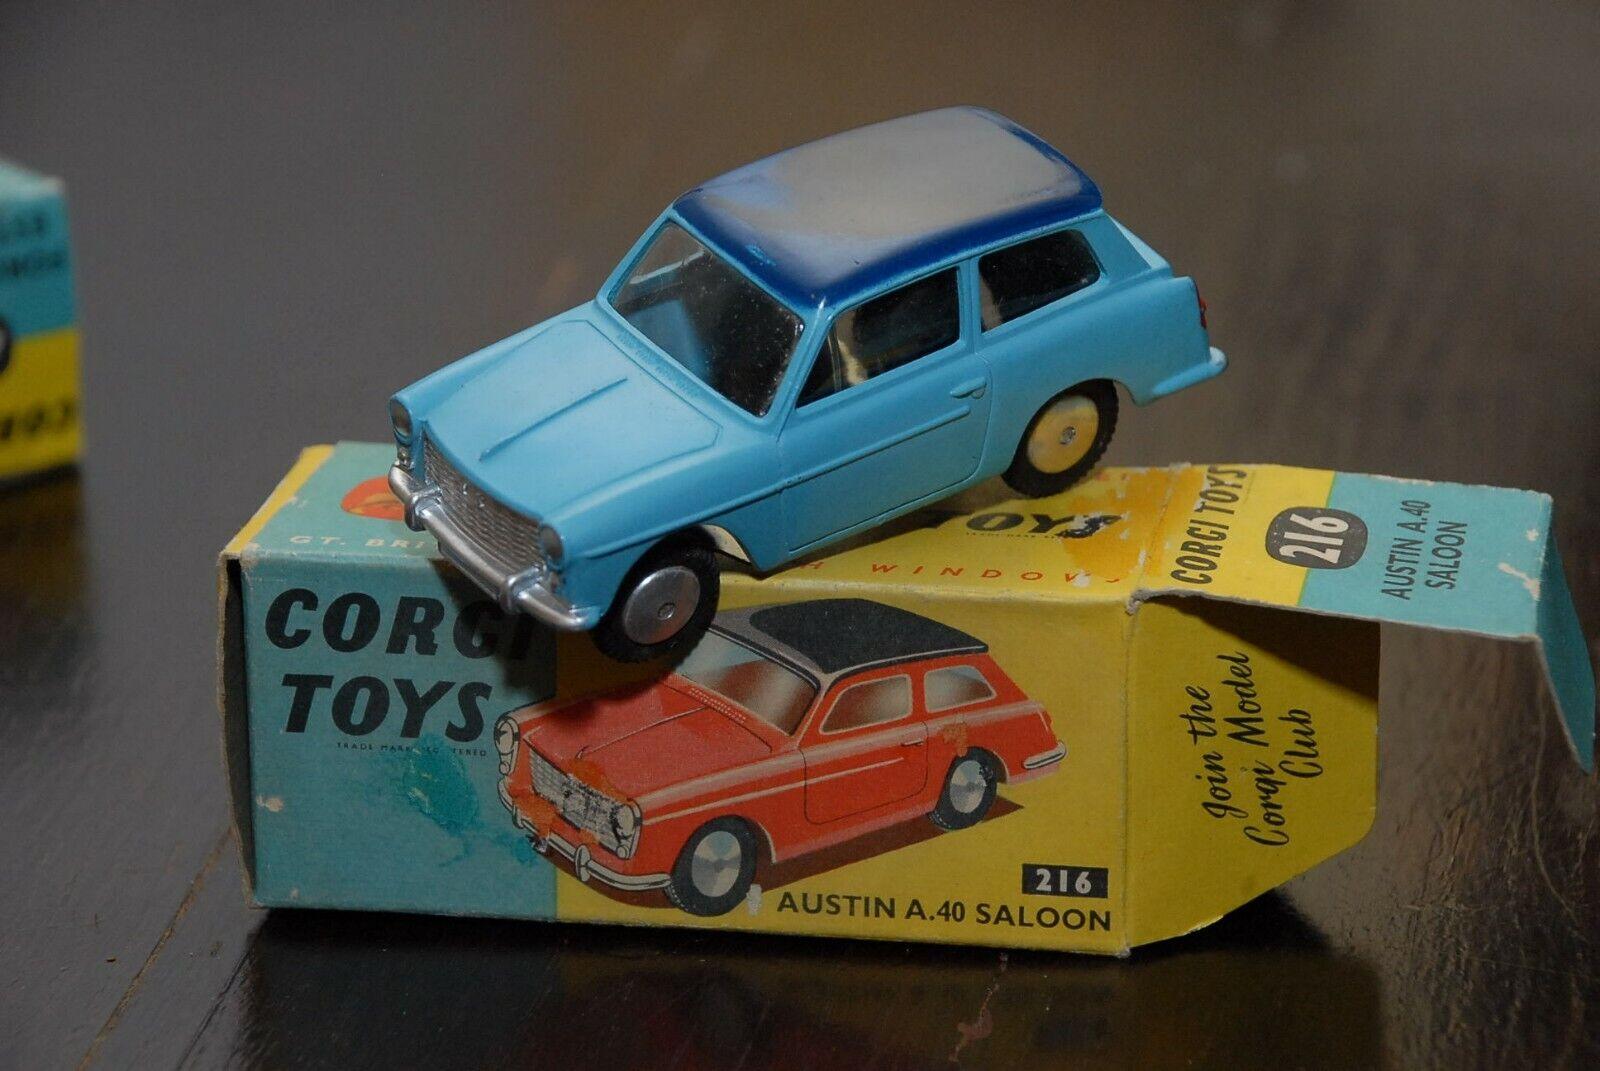 Corgi toys AUSTIN A.40